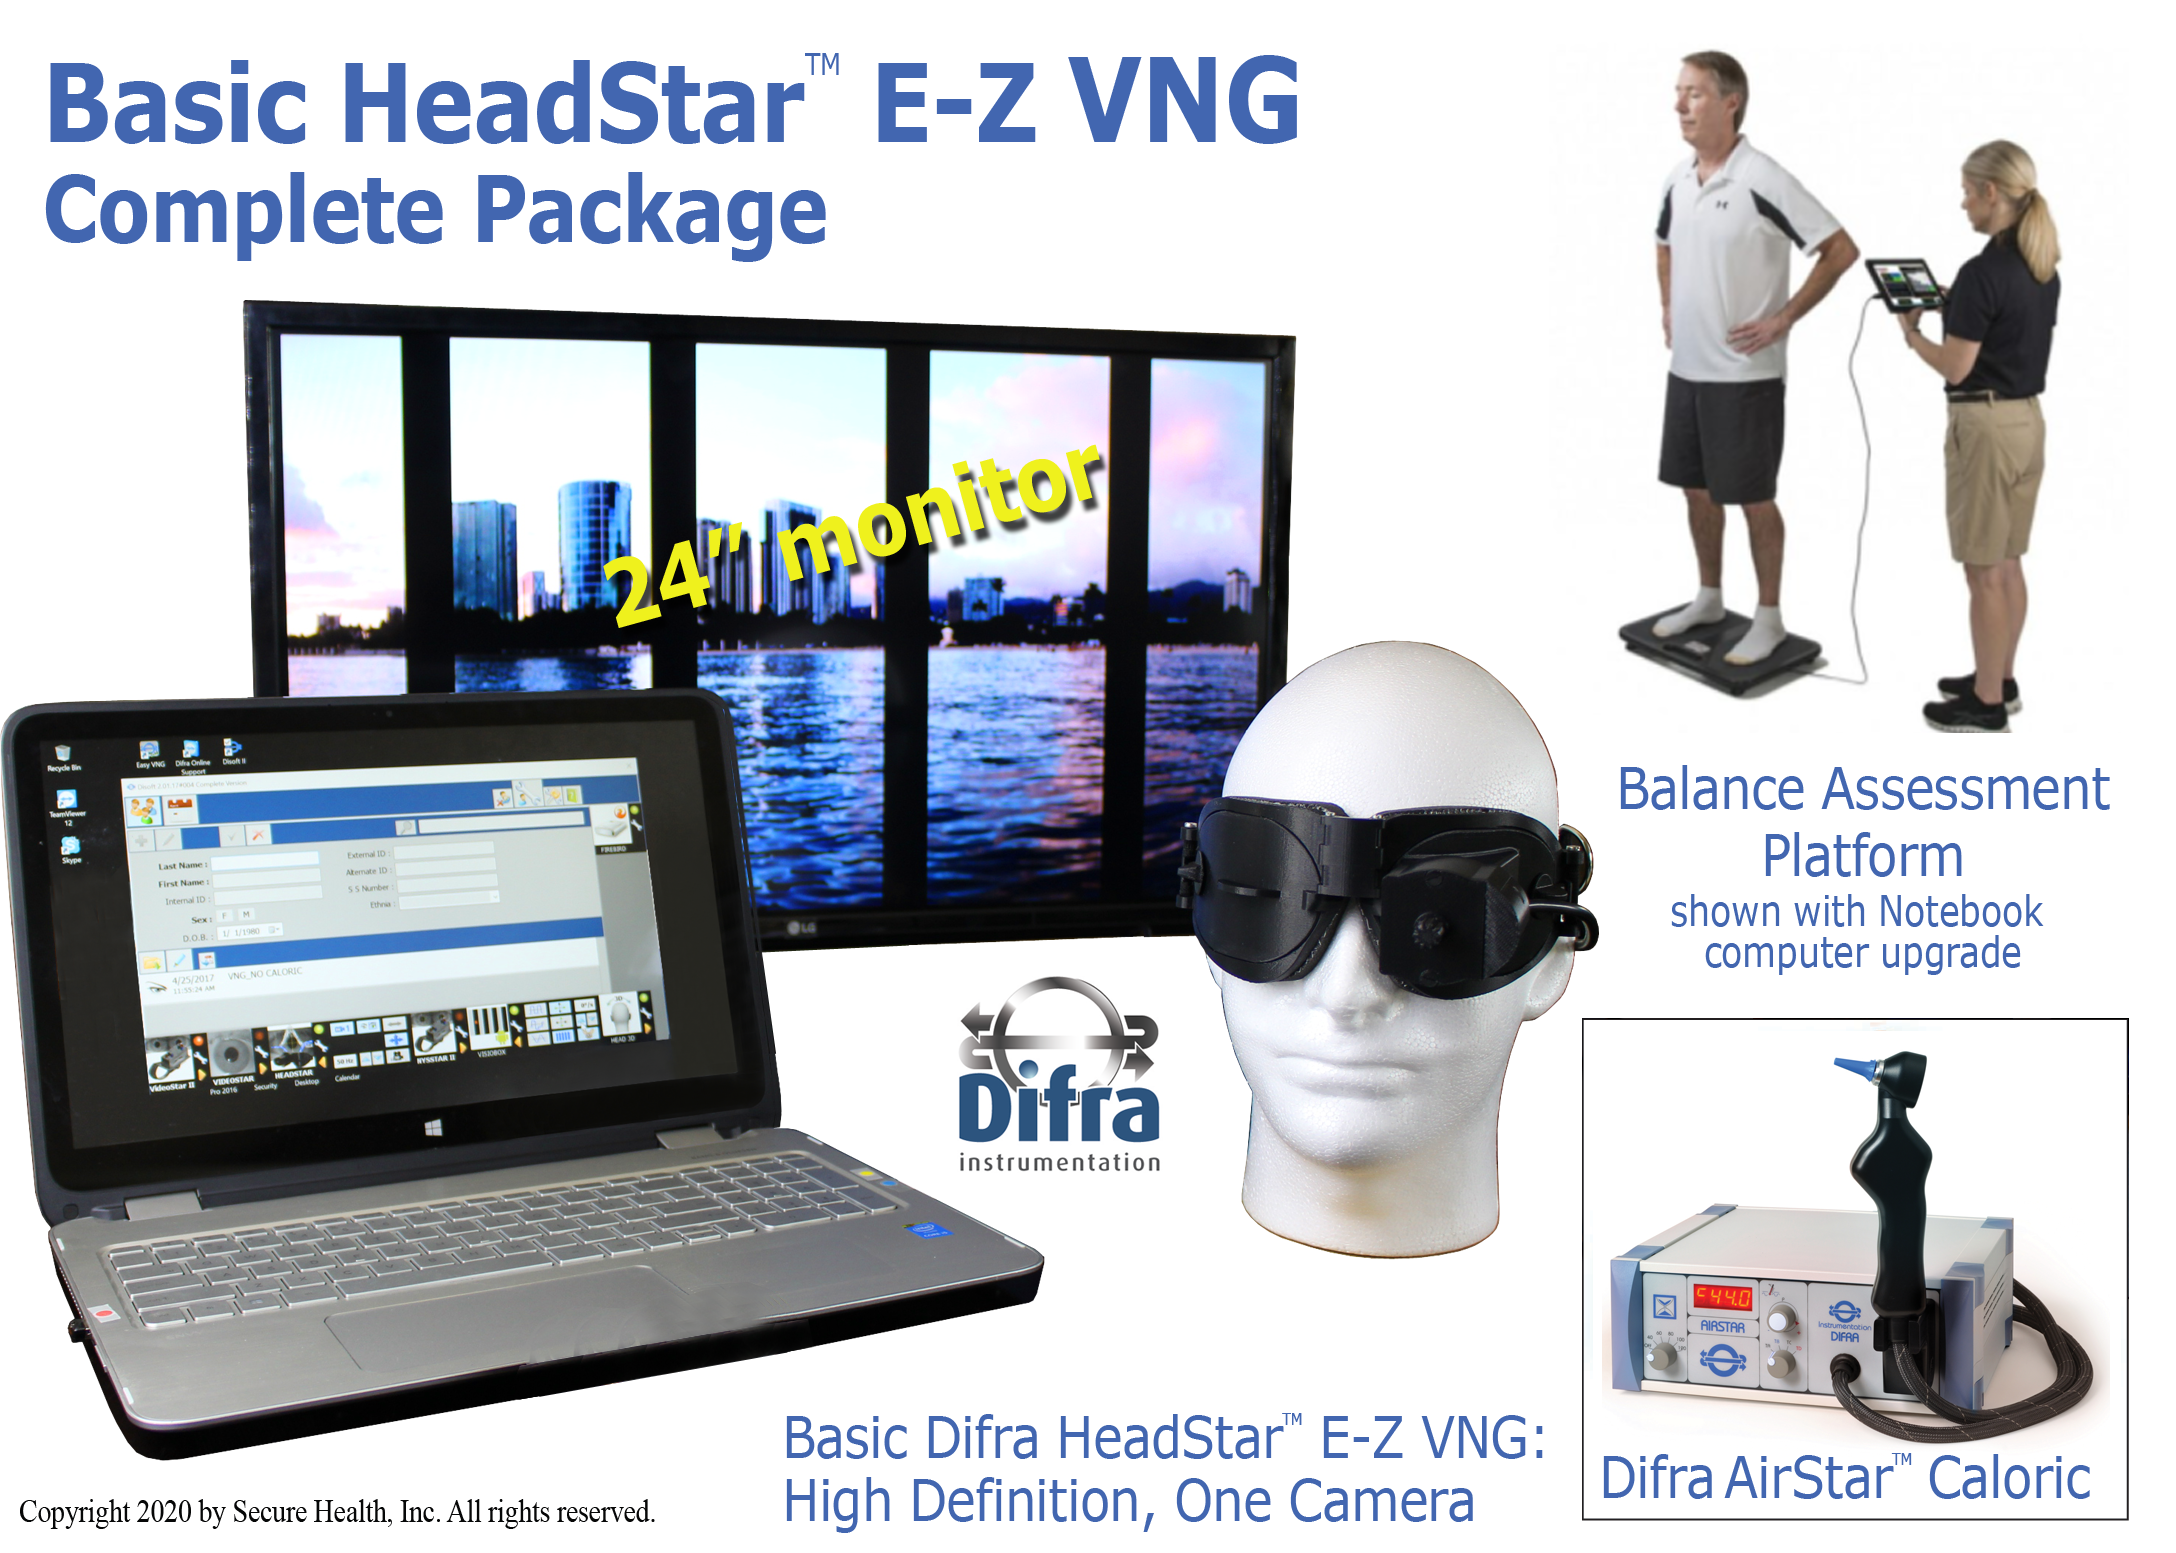 HeadStar E-Z VNG complete package, balance platform, caloric irrigator